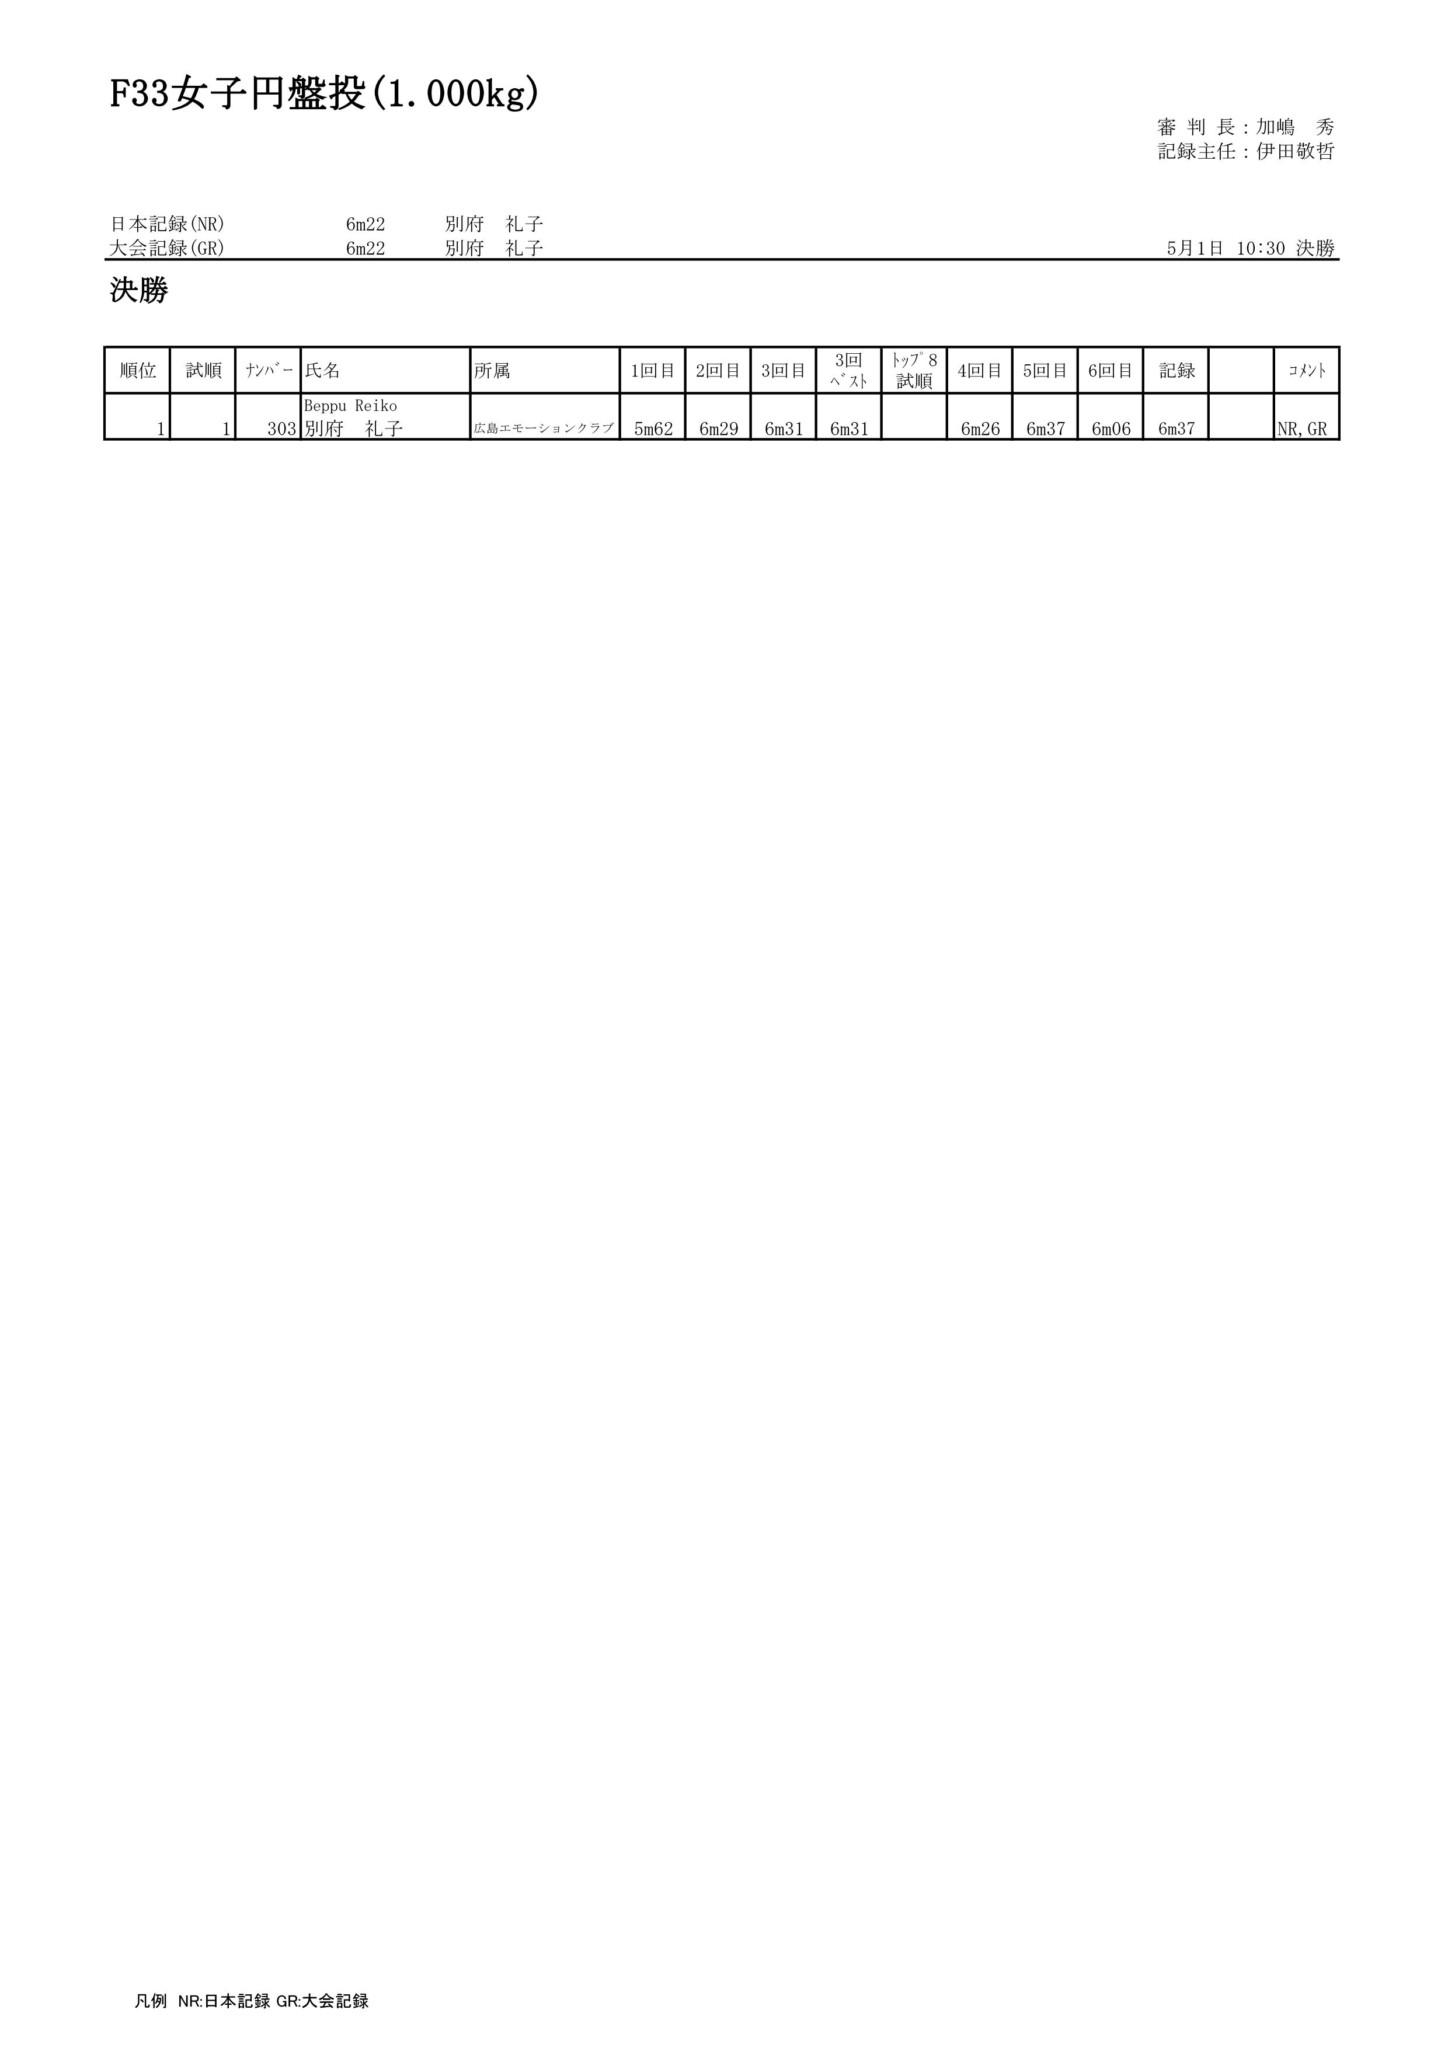 25F33女子円盤投(1.000kg)_01